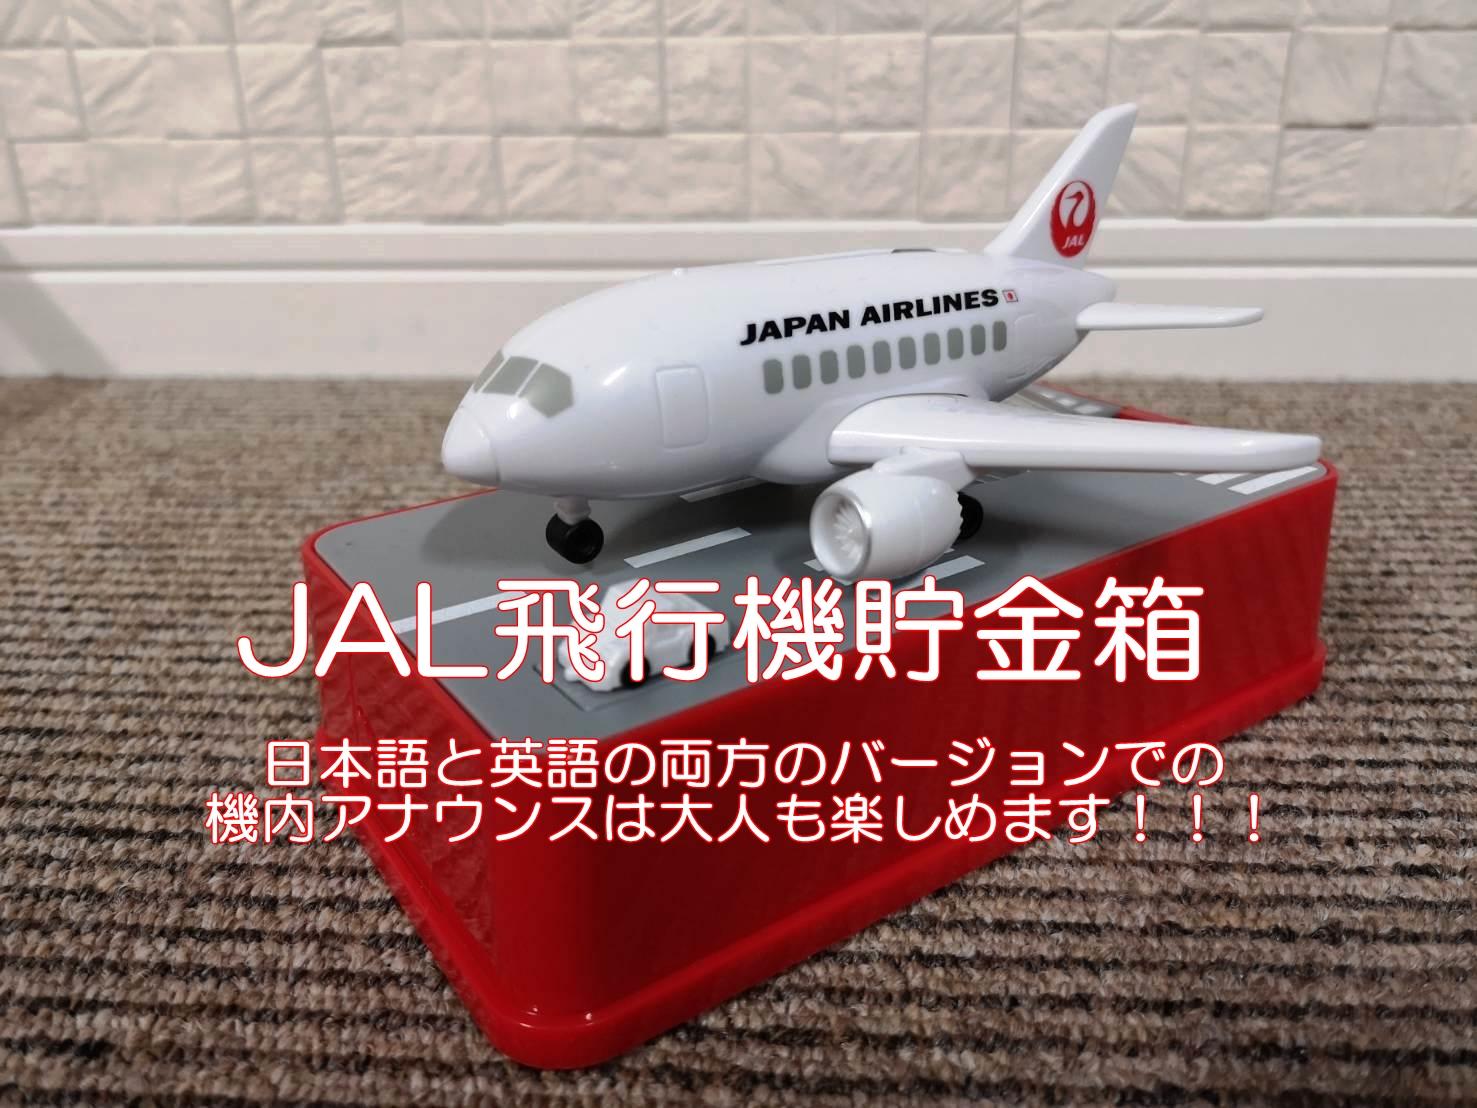 JAL飛行機貯金箱購入!ファンには堪らない音楽、動きが魅力的な空飛ぶBANK